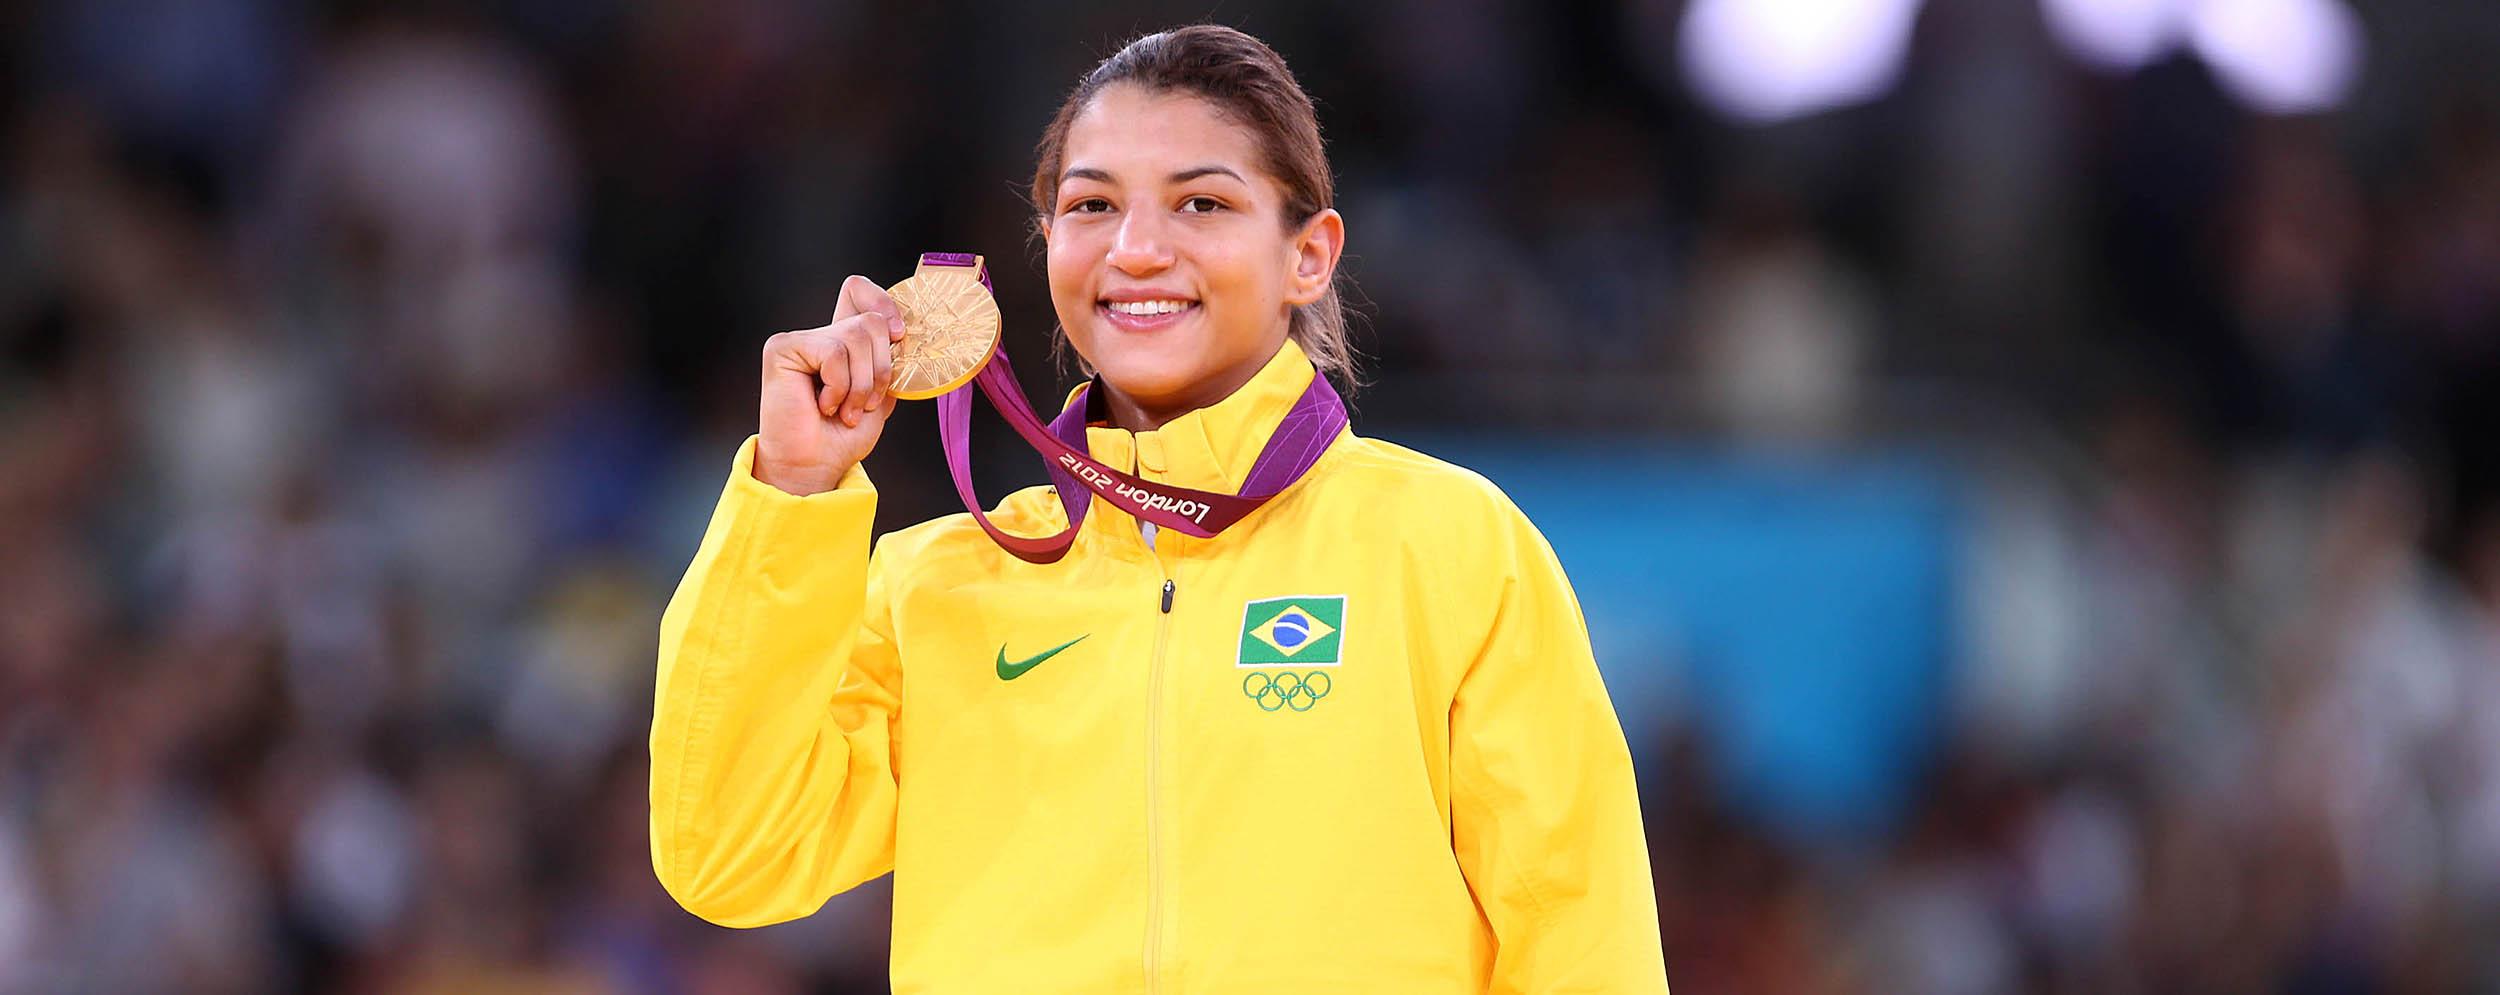 Judo Menezes